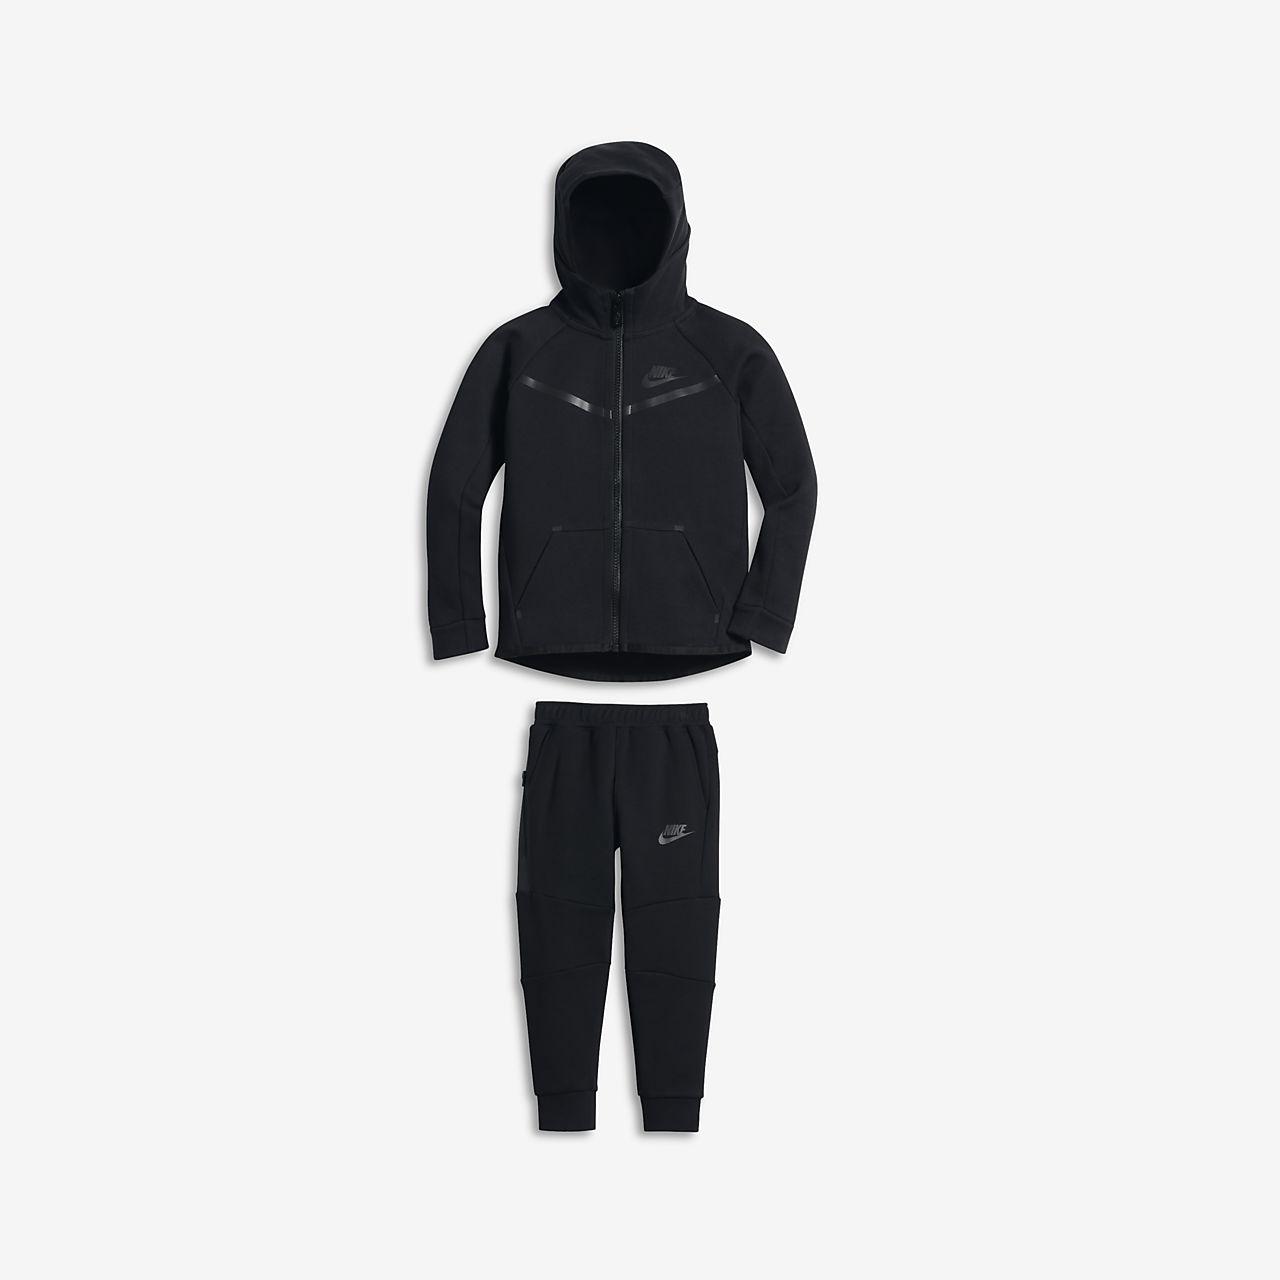 Completo in 2 pezzi Nike Tech Fleece - Bimbi piccoli